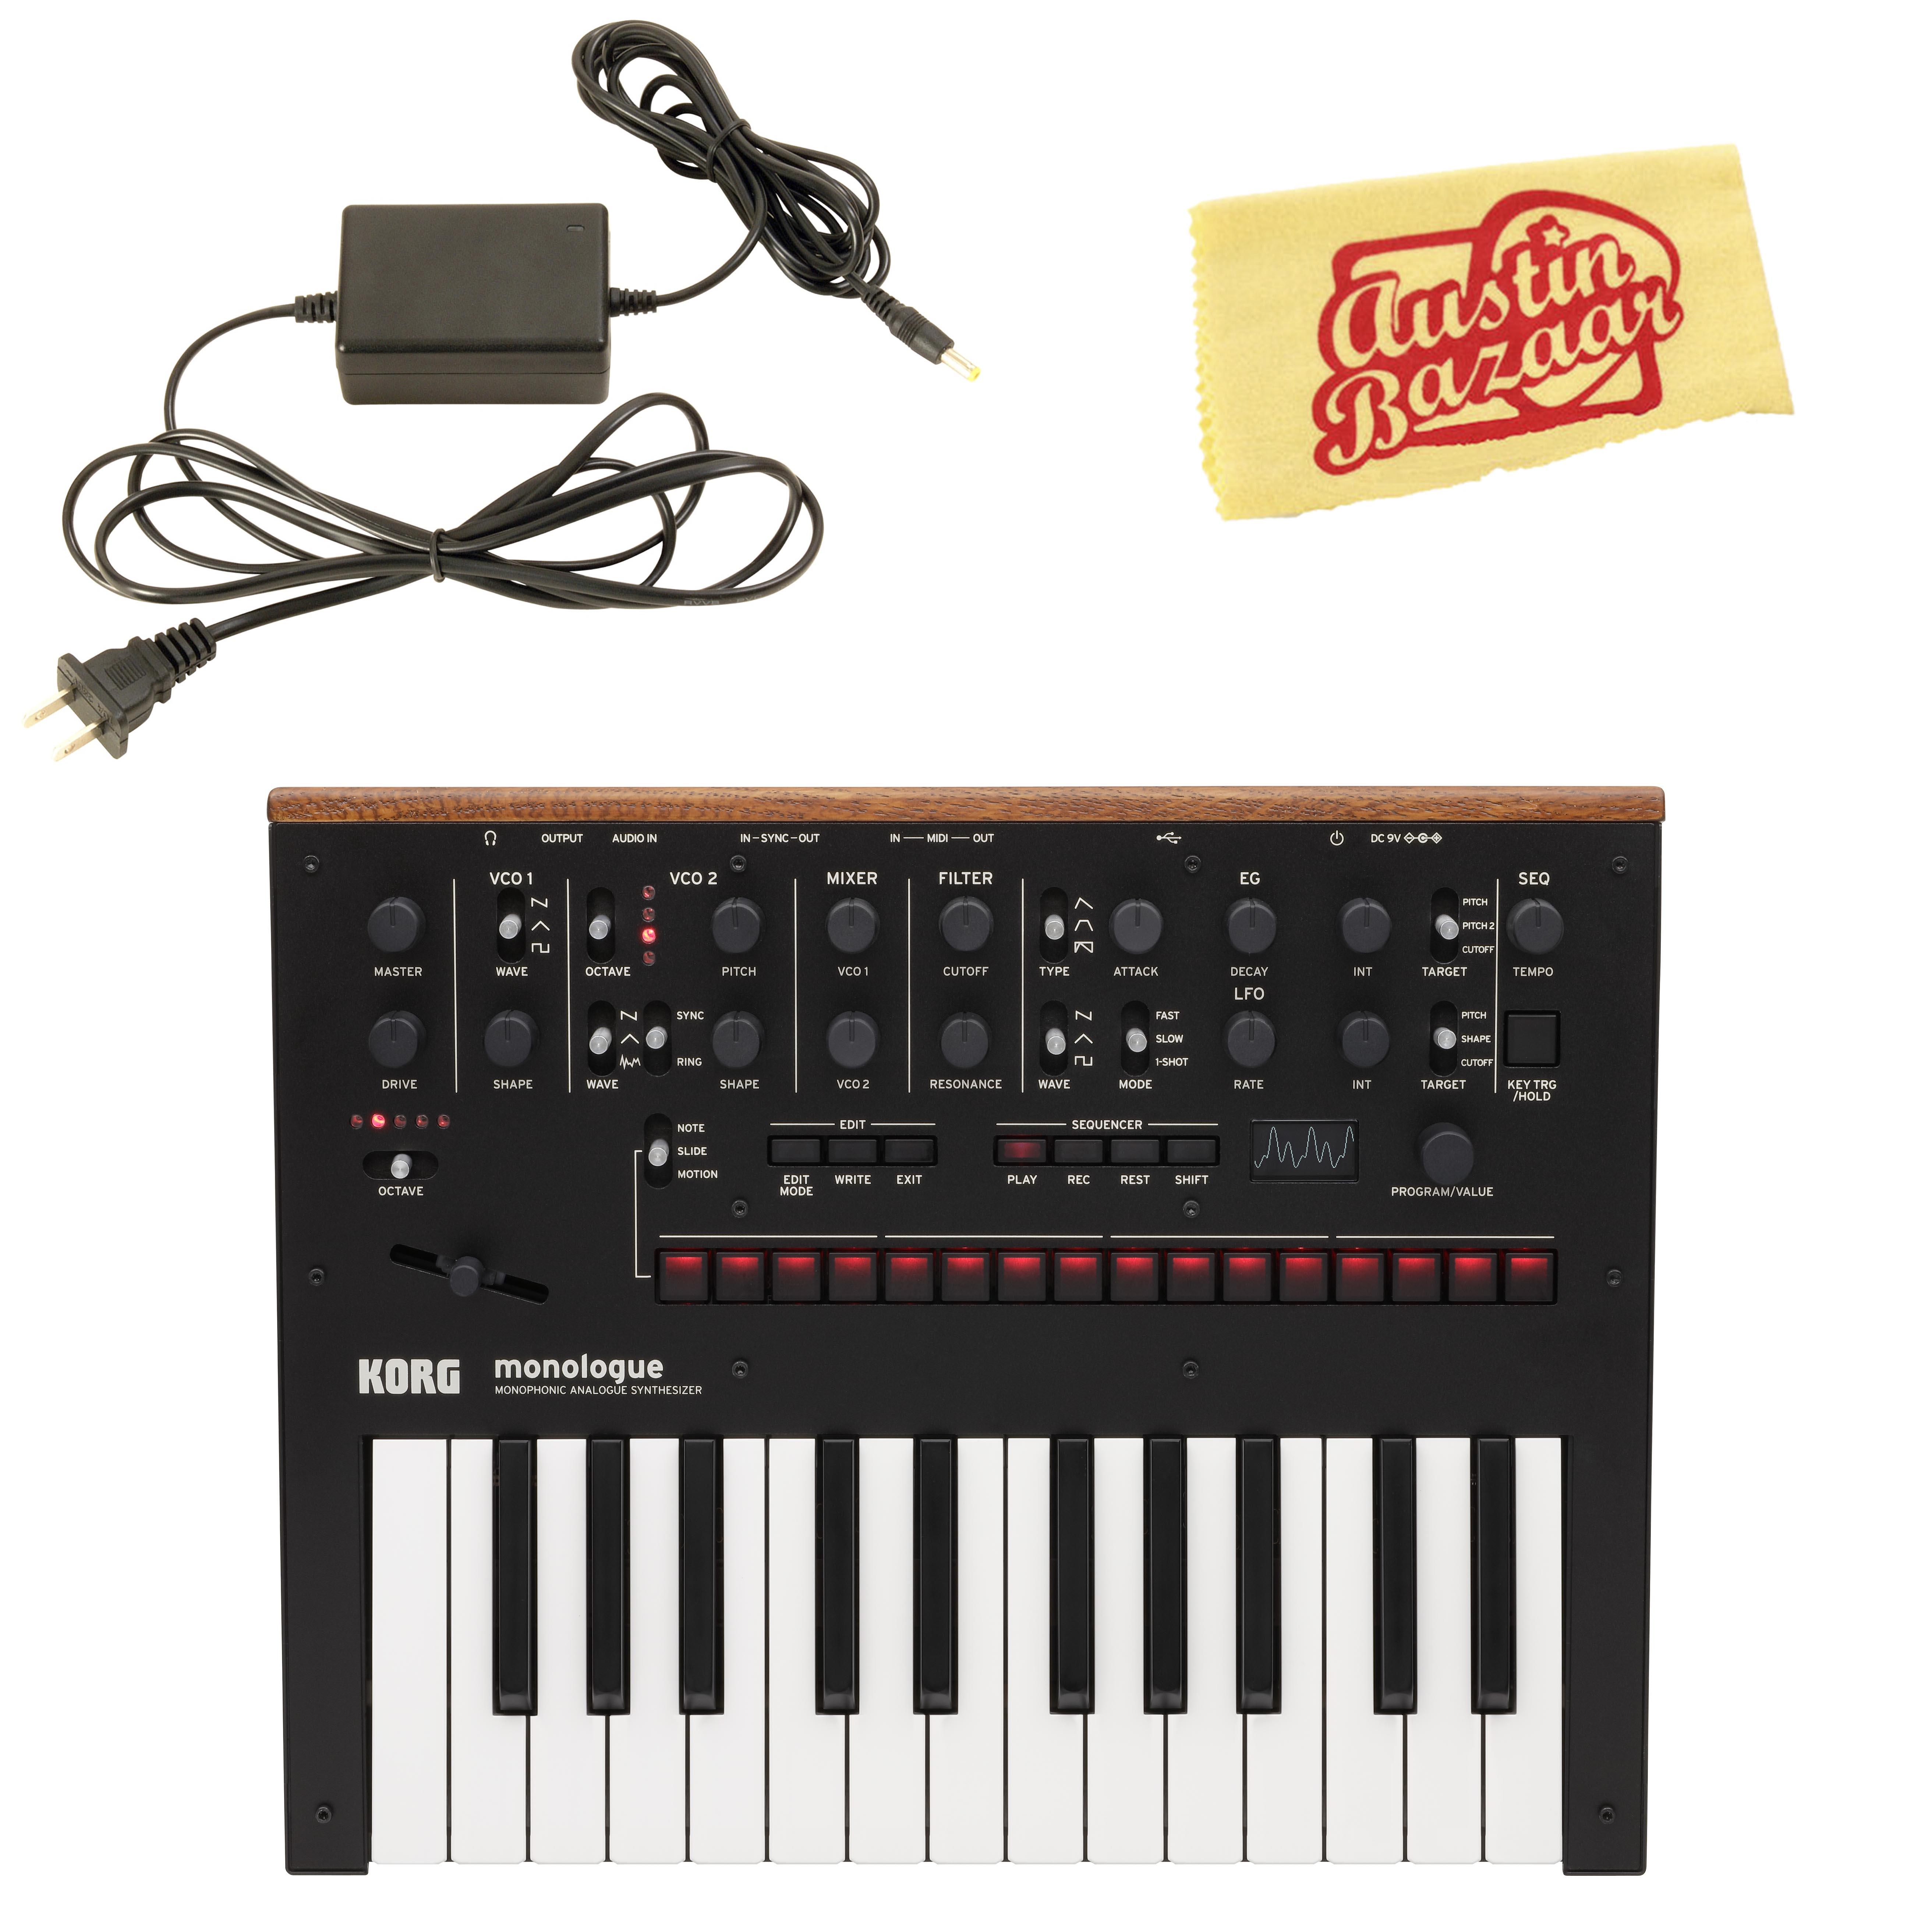 korg monologue monophonic analog synthesizer black w power supply for sale online ebay. Black Bedroom Furniture Sets. Home Design Ideas